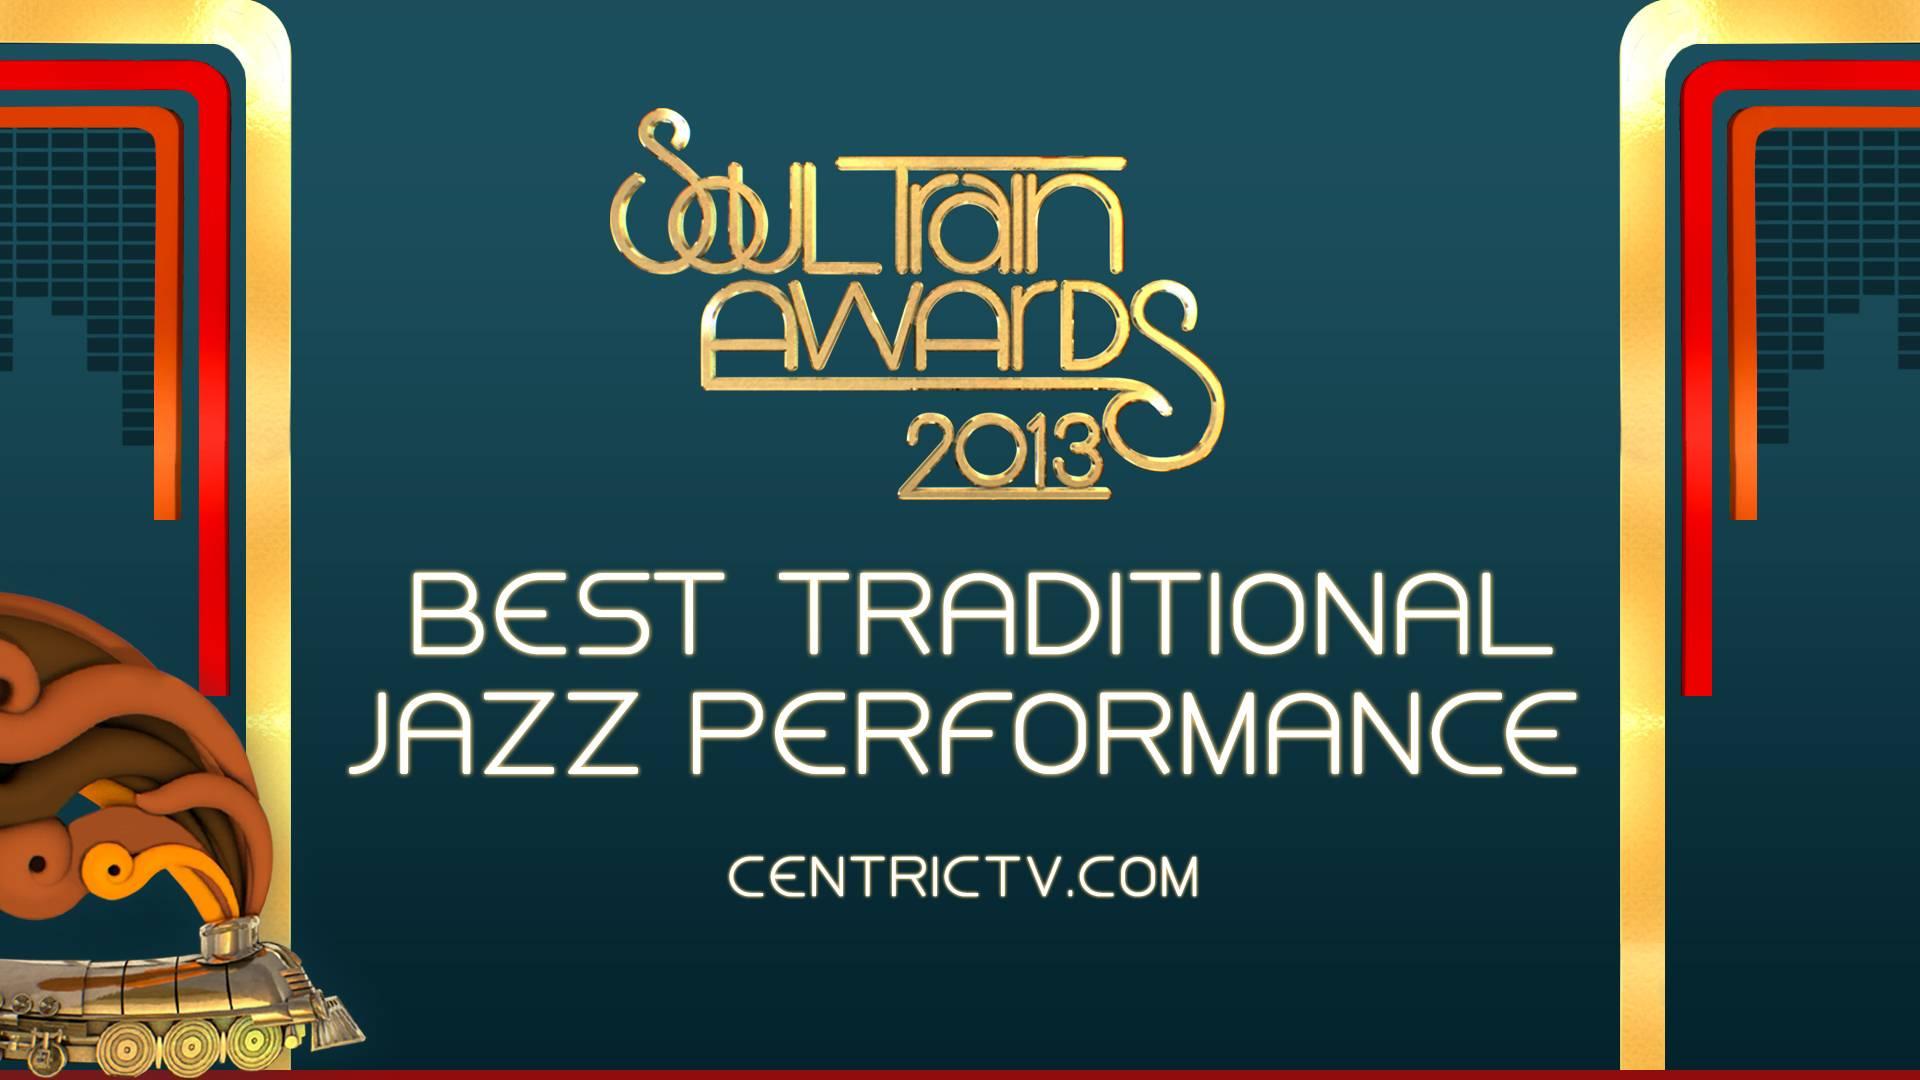 Best Traditional Jazz Performance